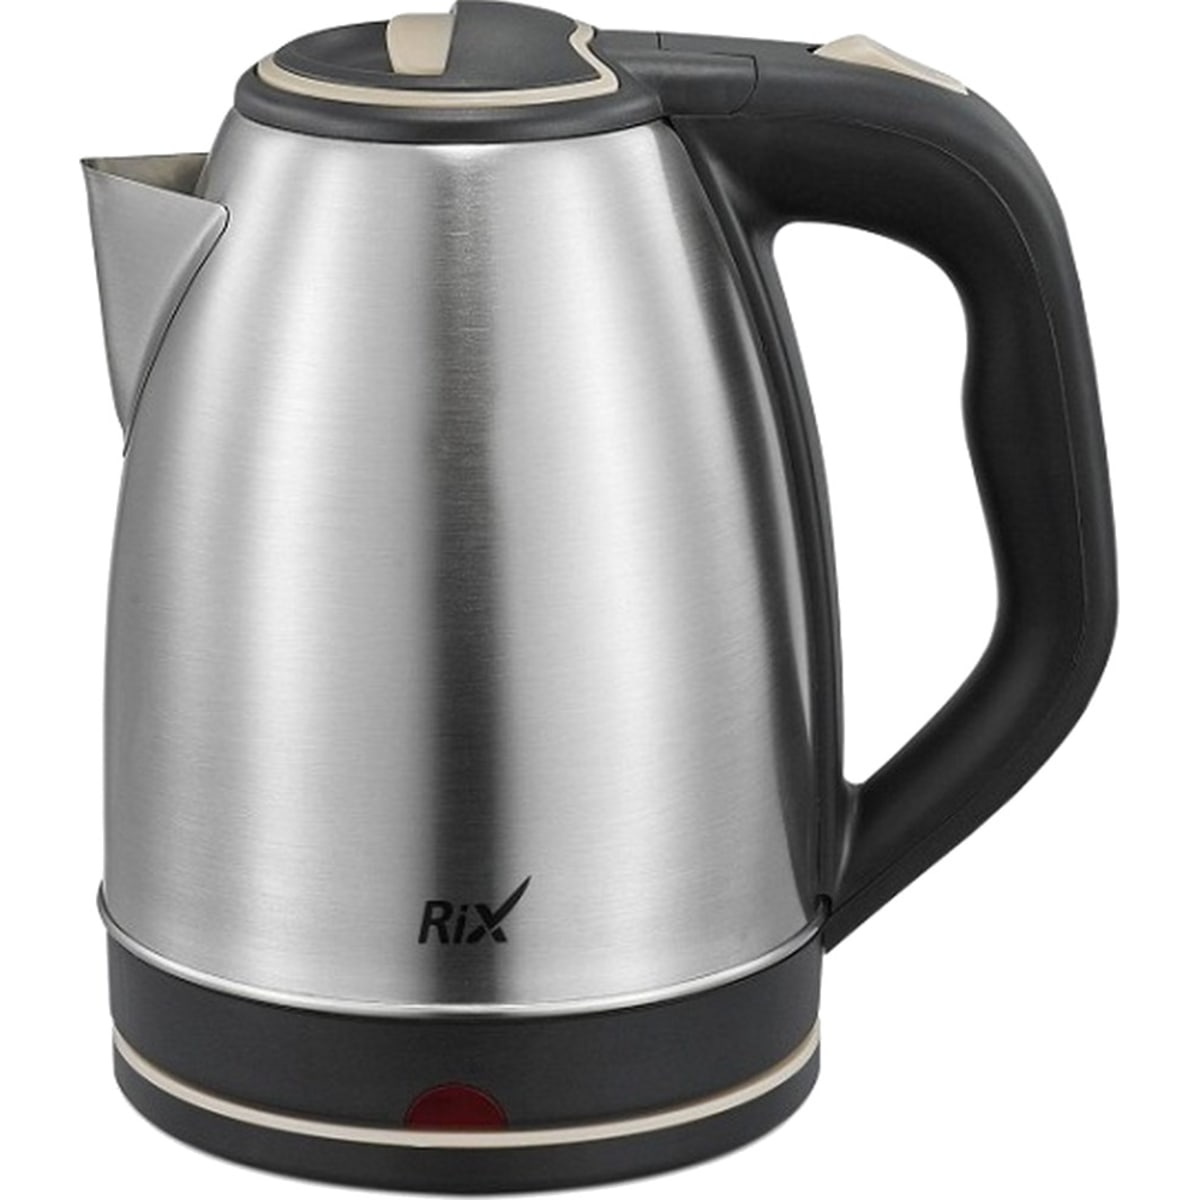 Электрический чайник RIX RKT-1802S, 1.8 л